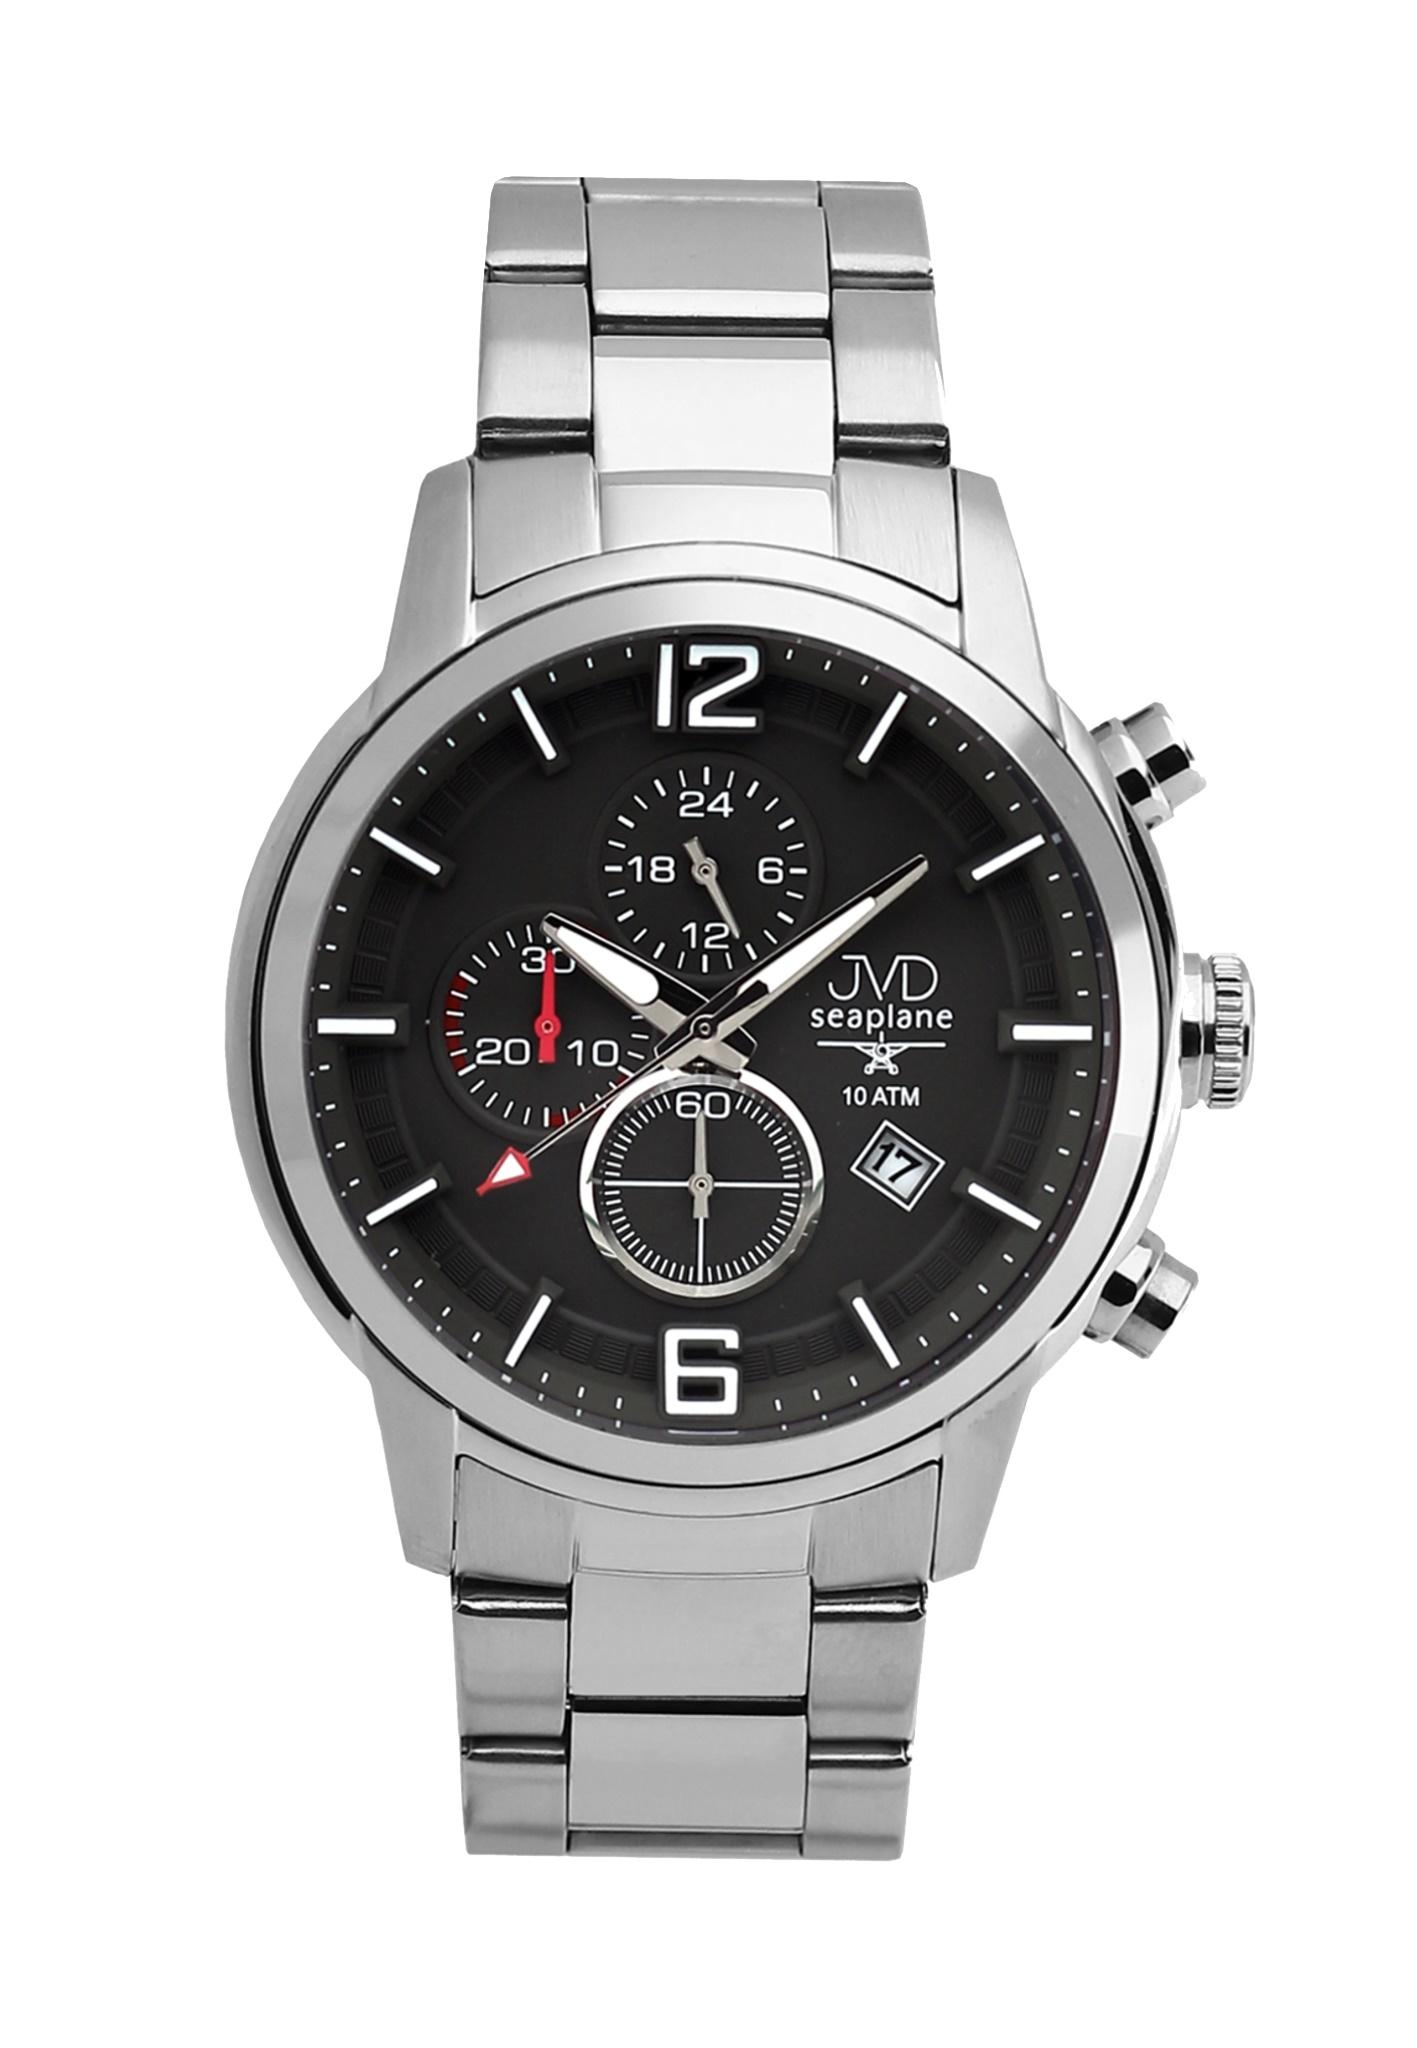 Vysoce odolné černé vodotěsné chronografy hodinky JVD Seaplane METEOR JC667.4 (POŠTOVNÉ ZDARMA!!)